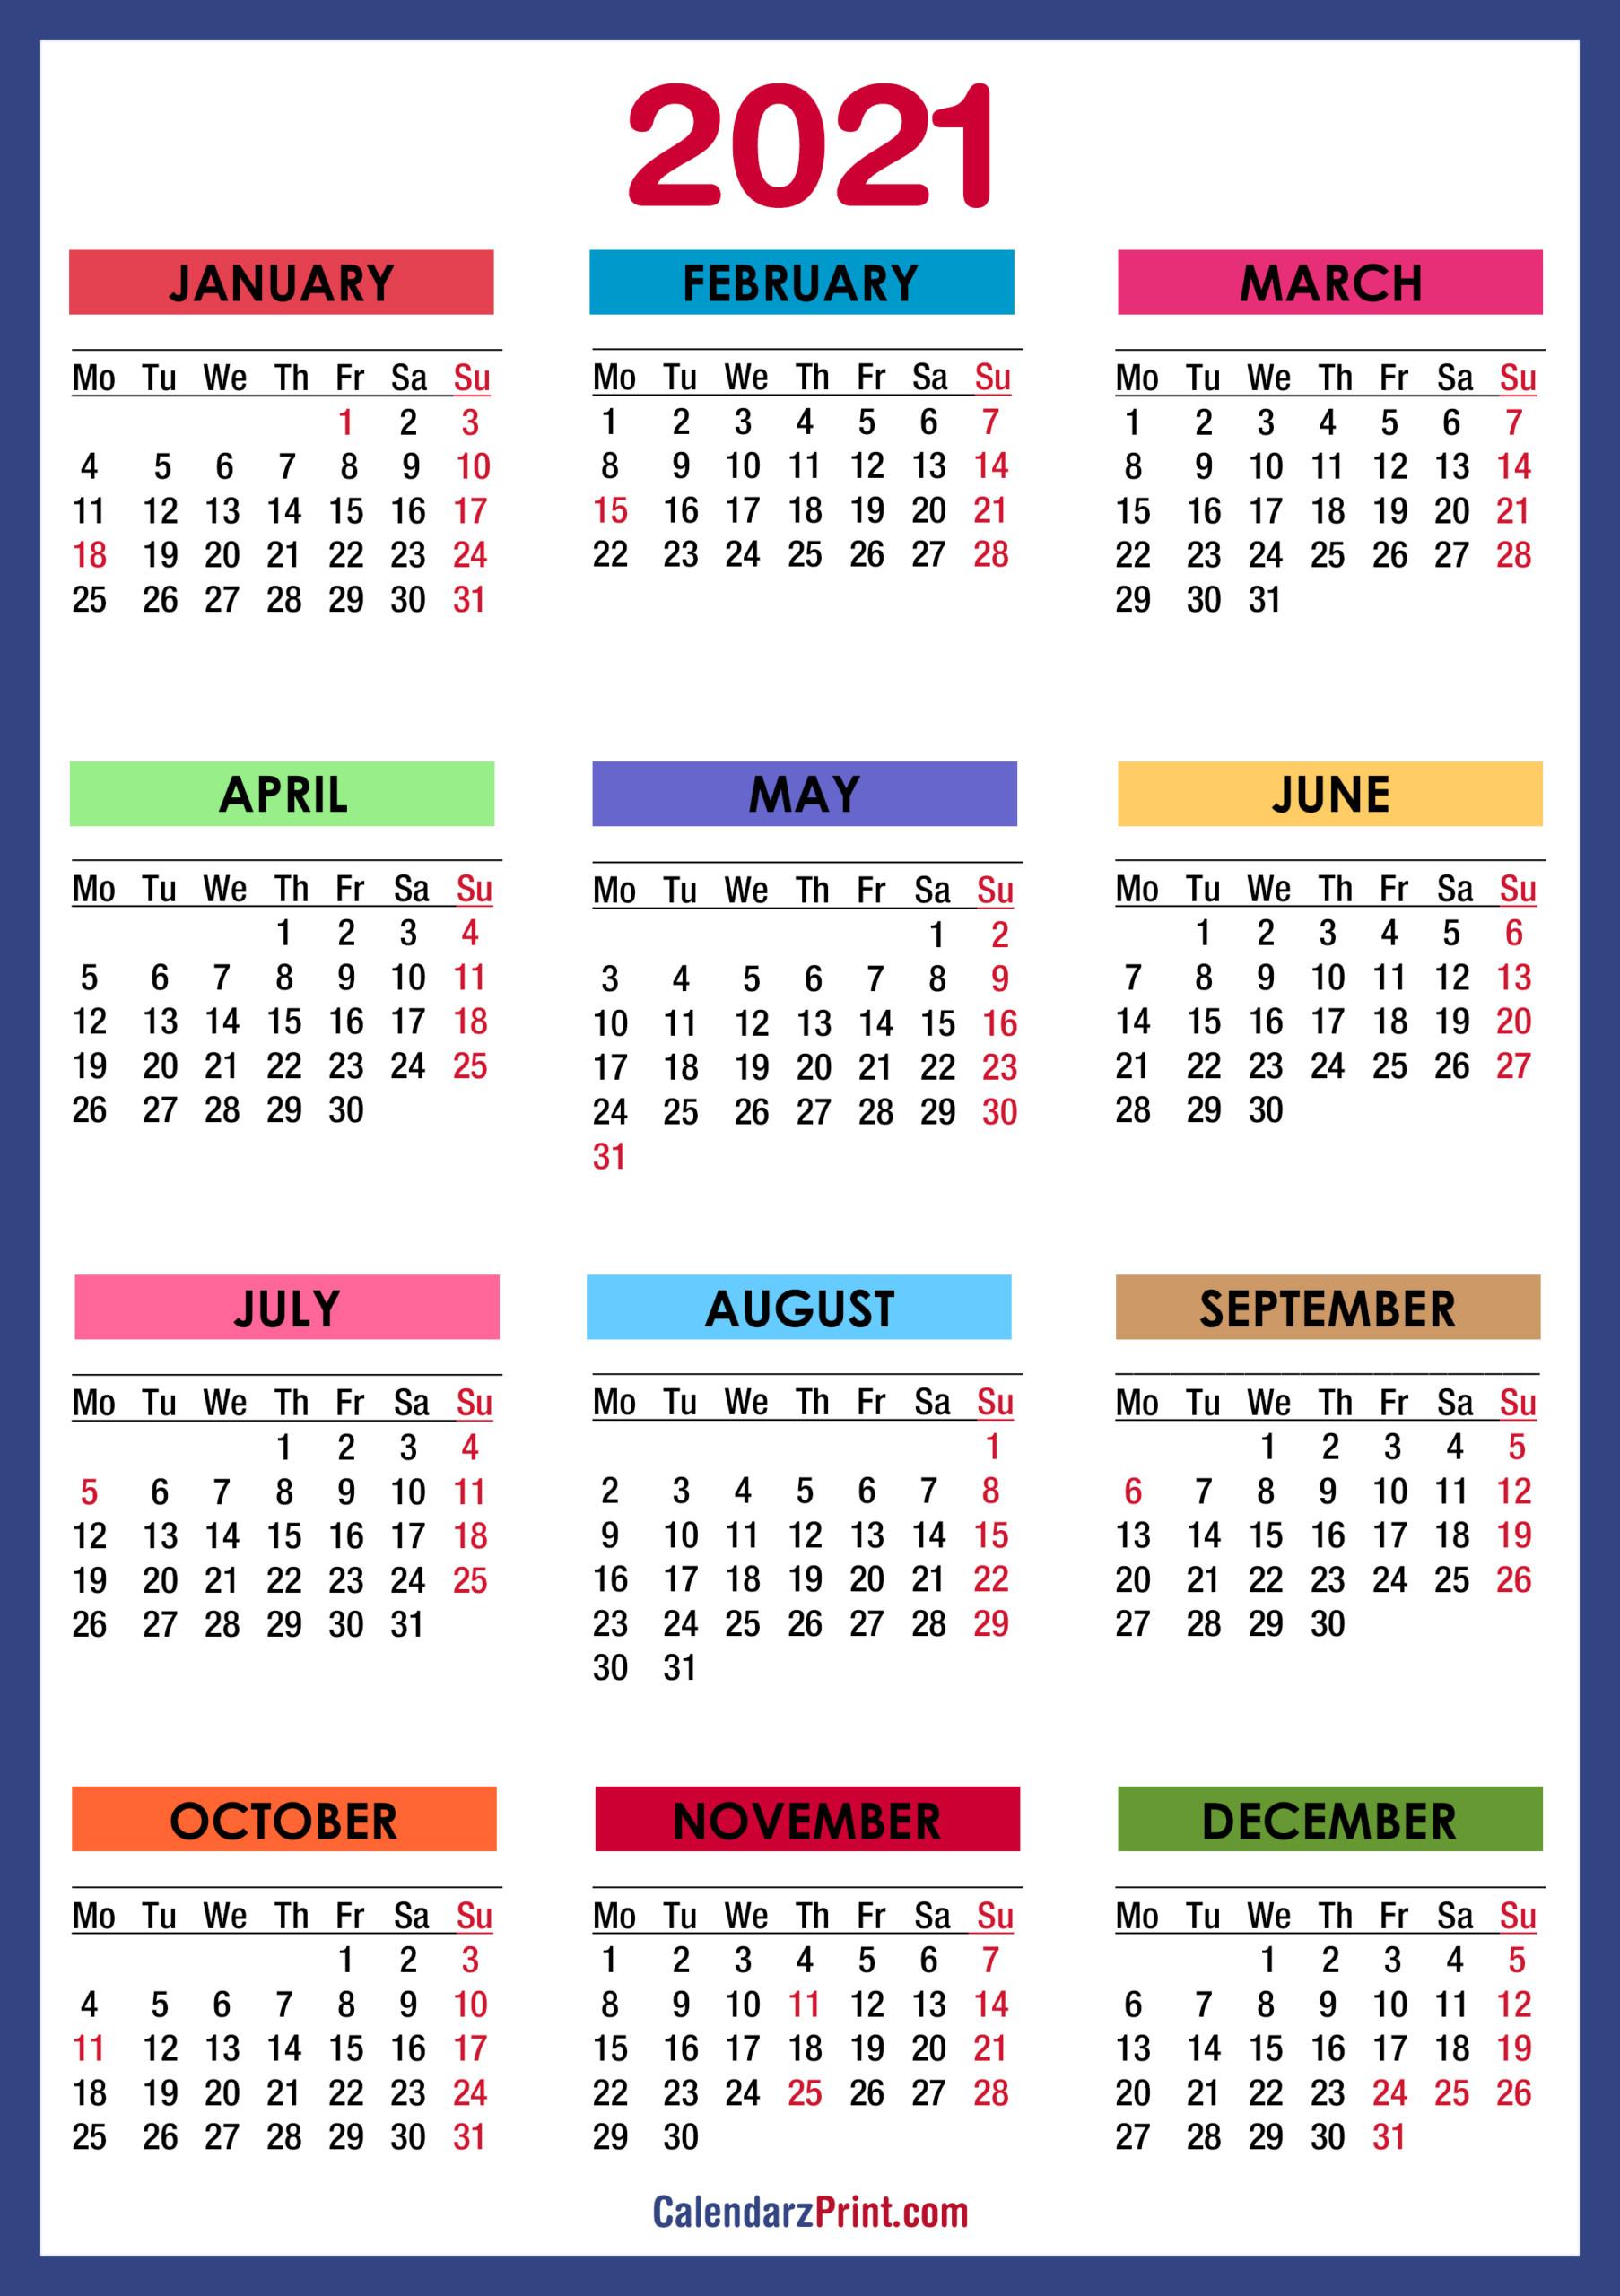 2021 Calendar With Us Holidays Printable Pdf | 2021